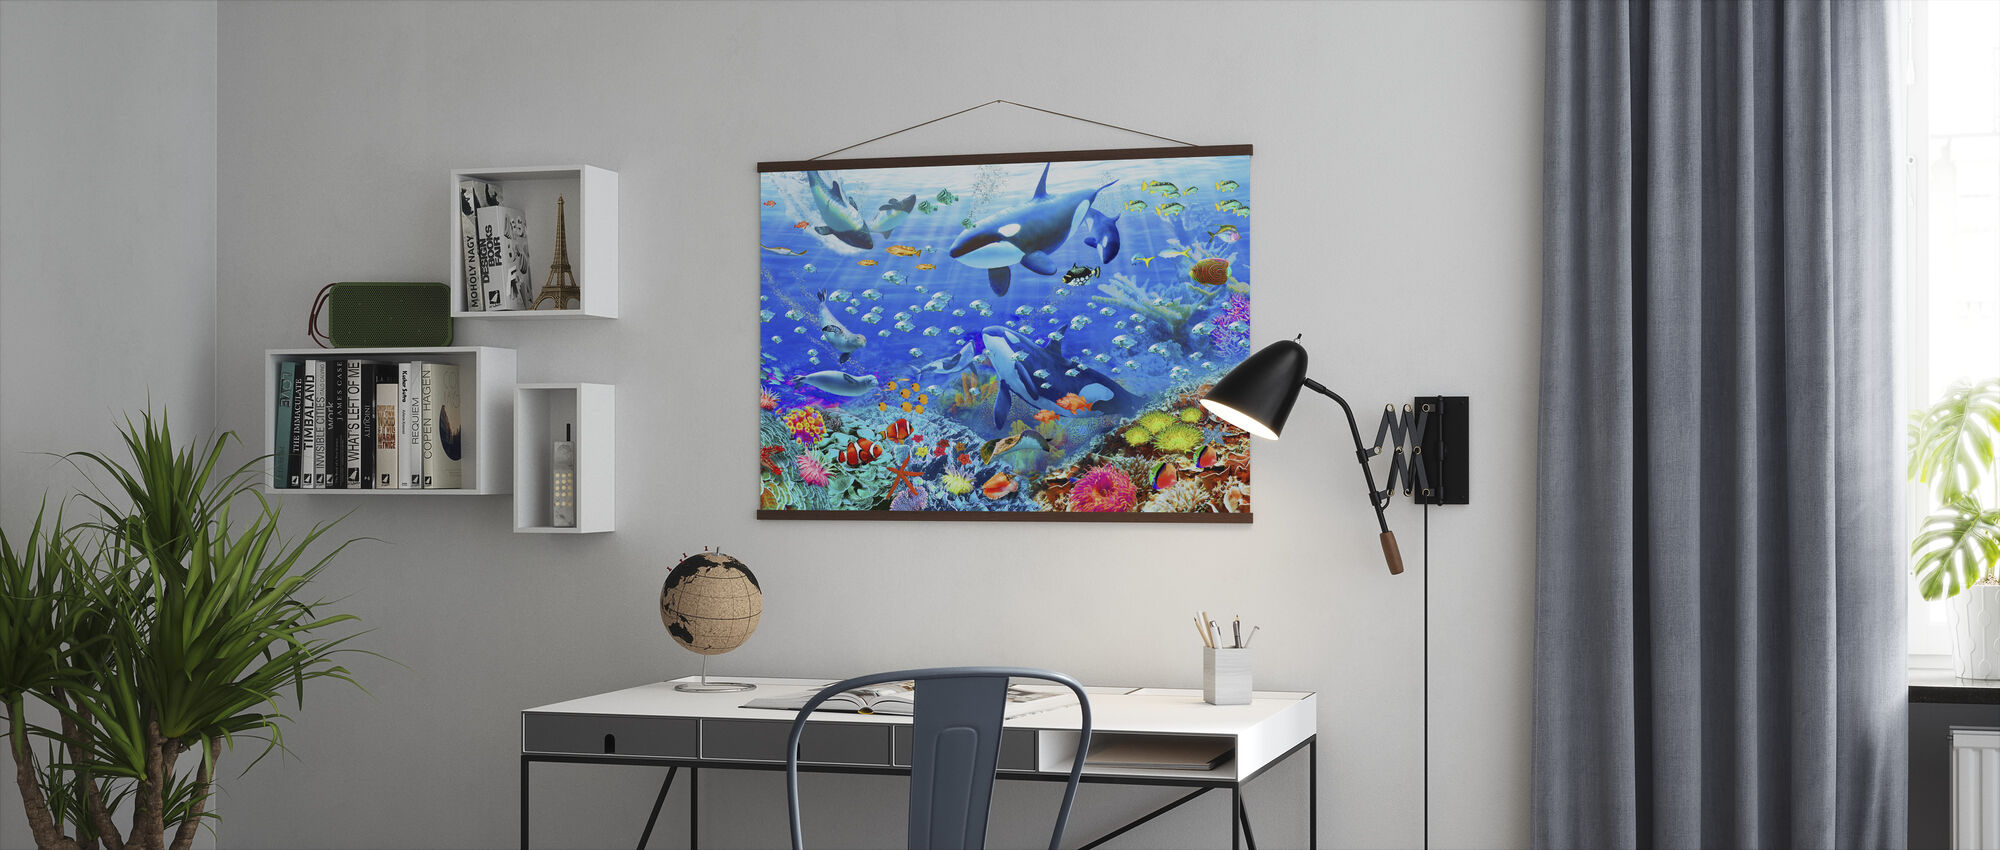 Undervanns Panorama - Plakat - Kontor